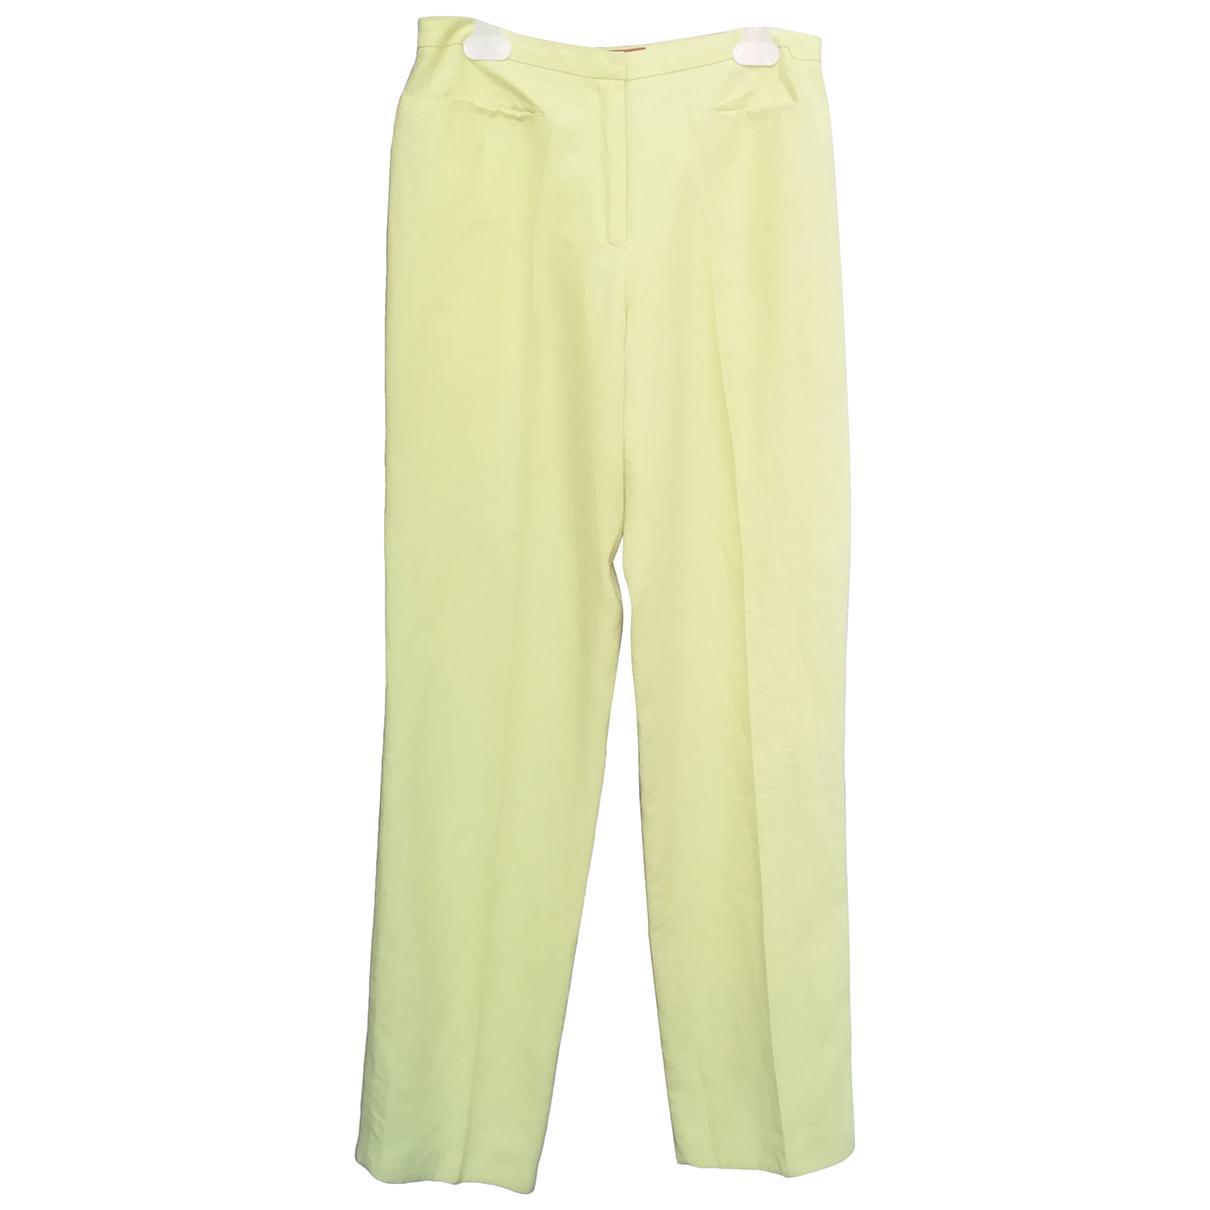 Kenzo \N Yellow Linen Trousers for Women 42 FR